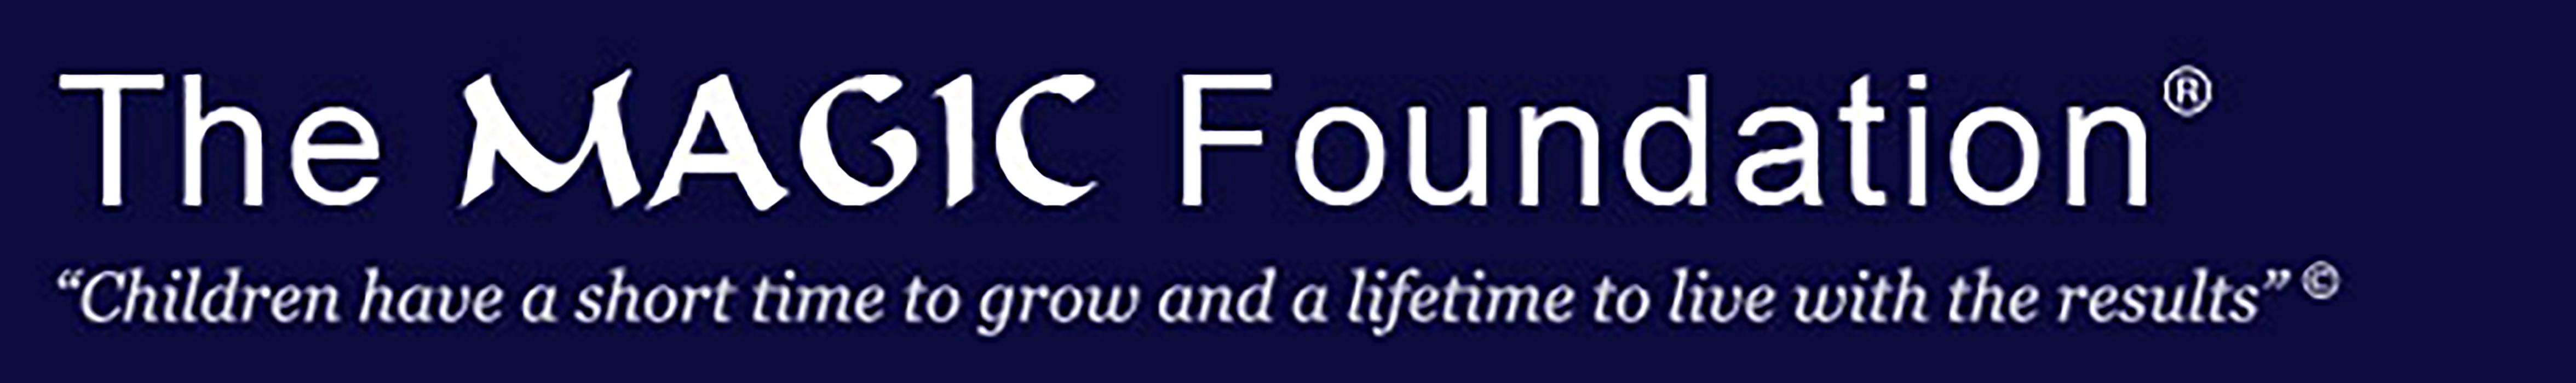 The MAGIC Foundation header image